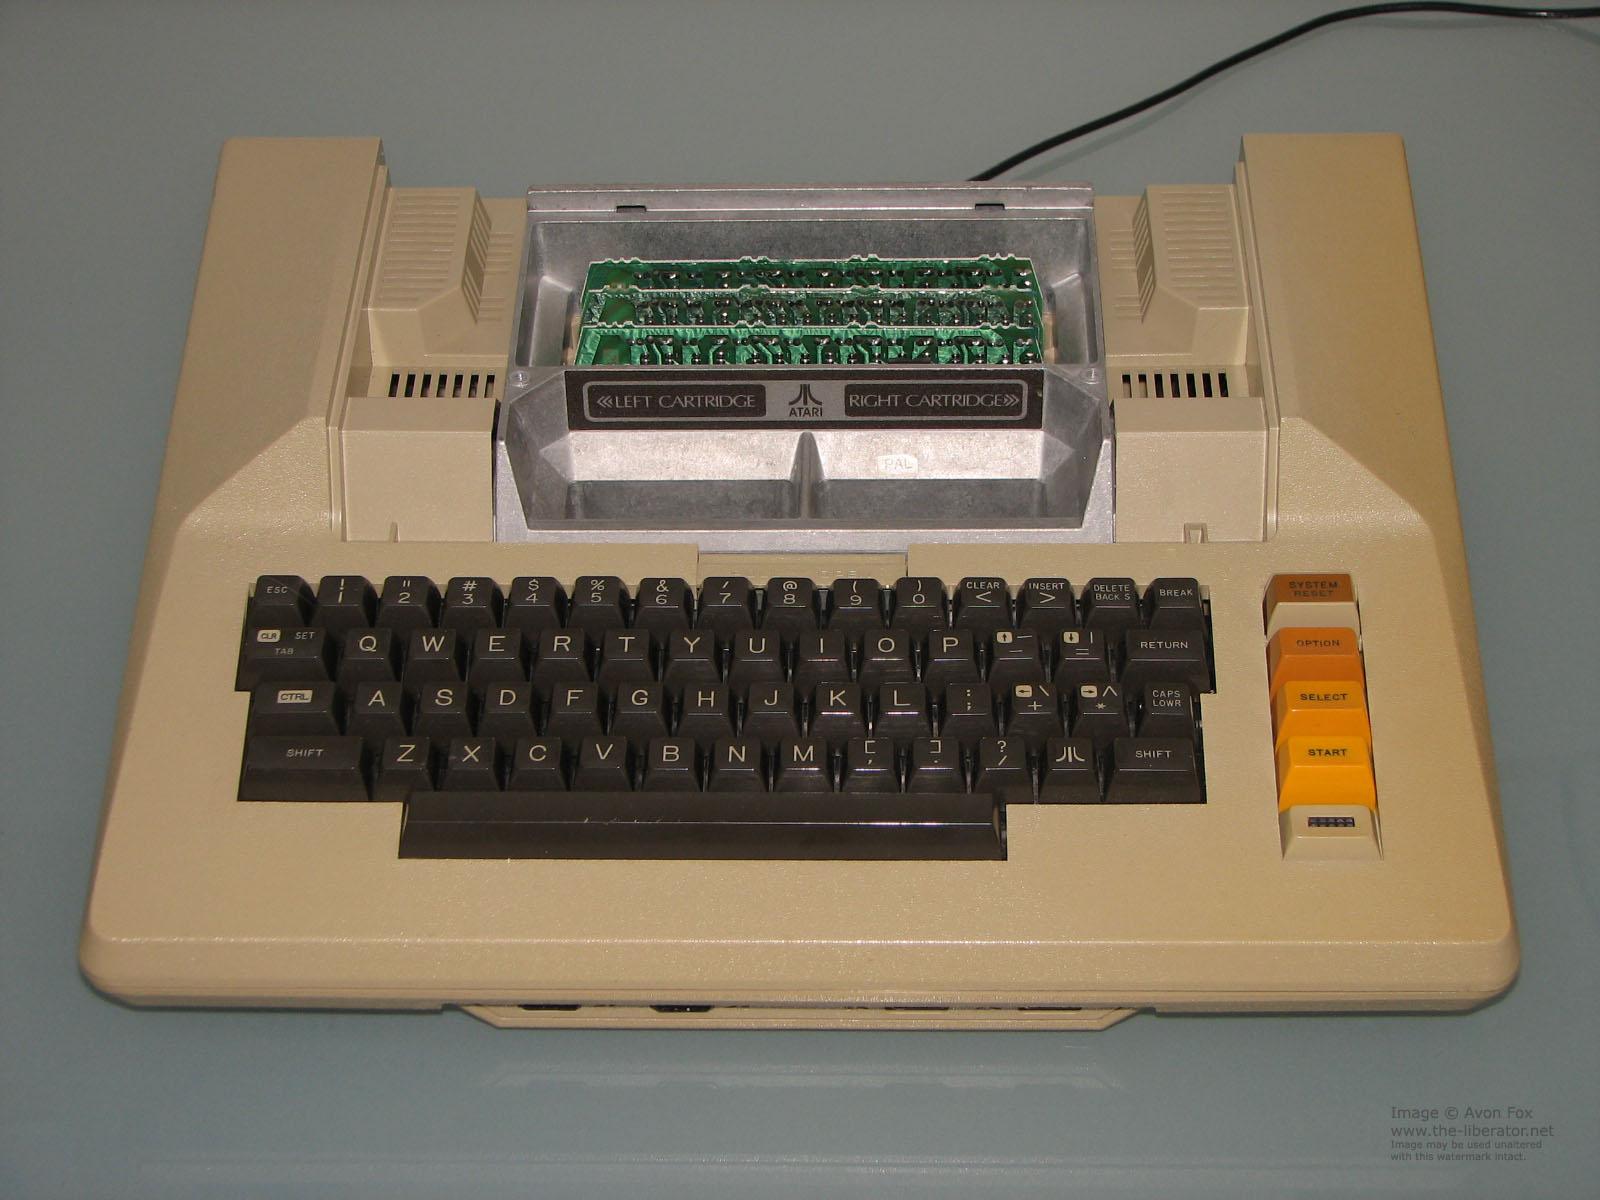 Atari 800 Disassembled